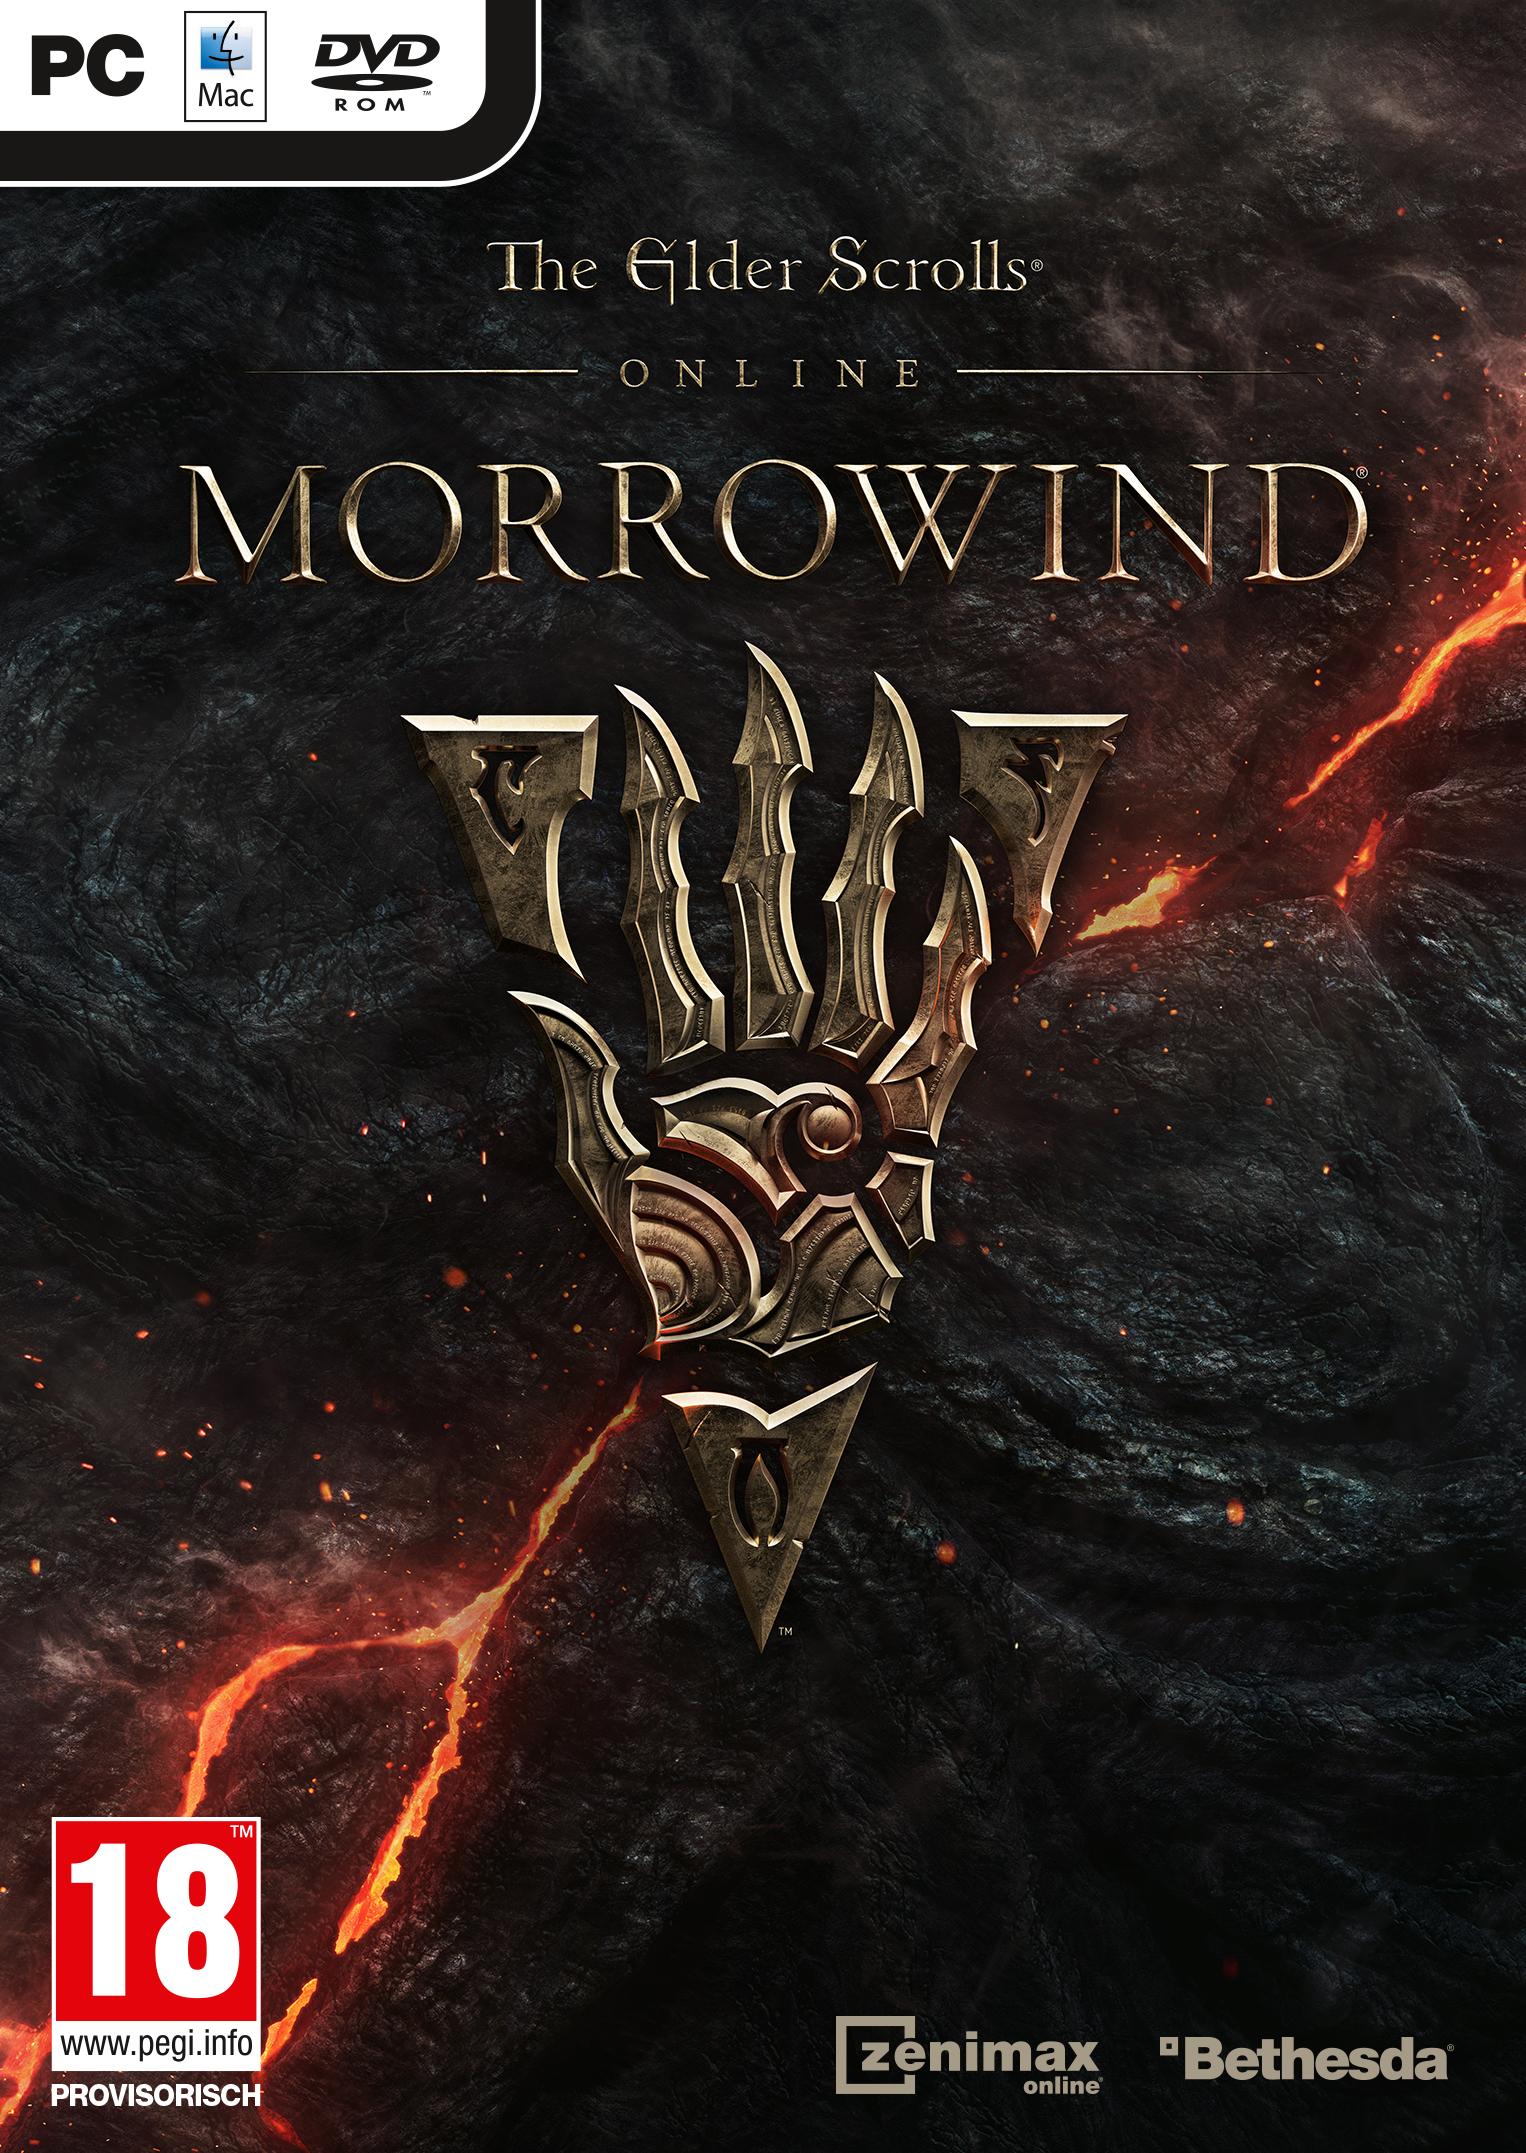 Bild The Elder Scrolls Online - Morrowind